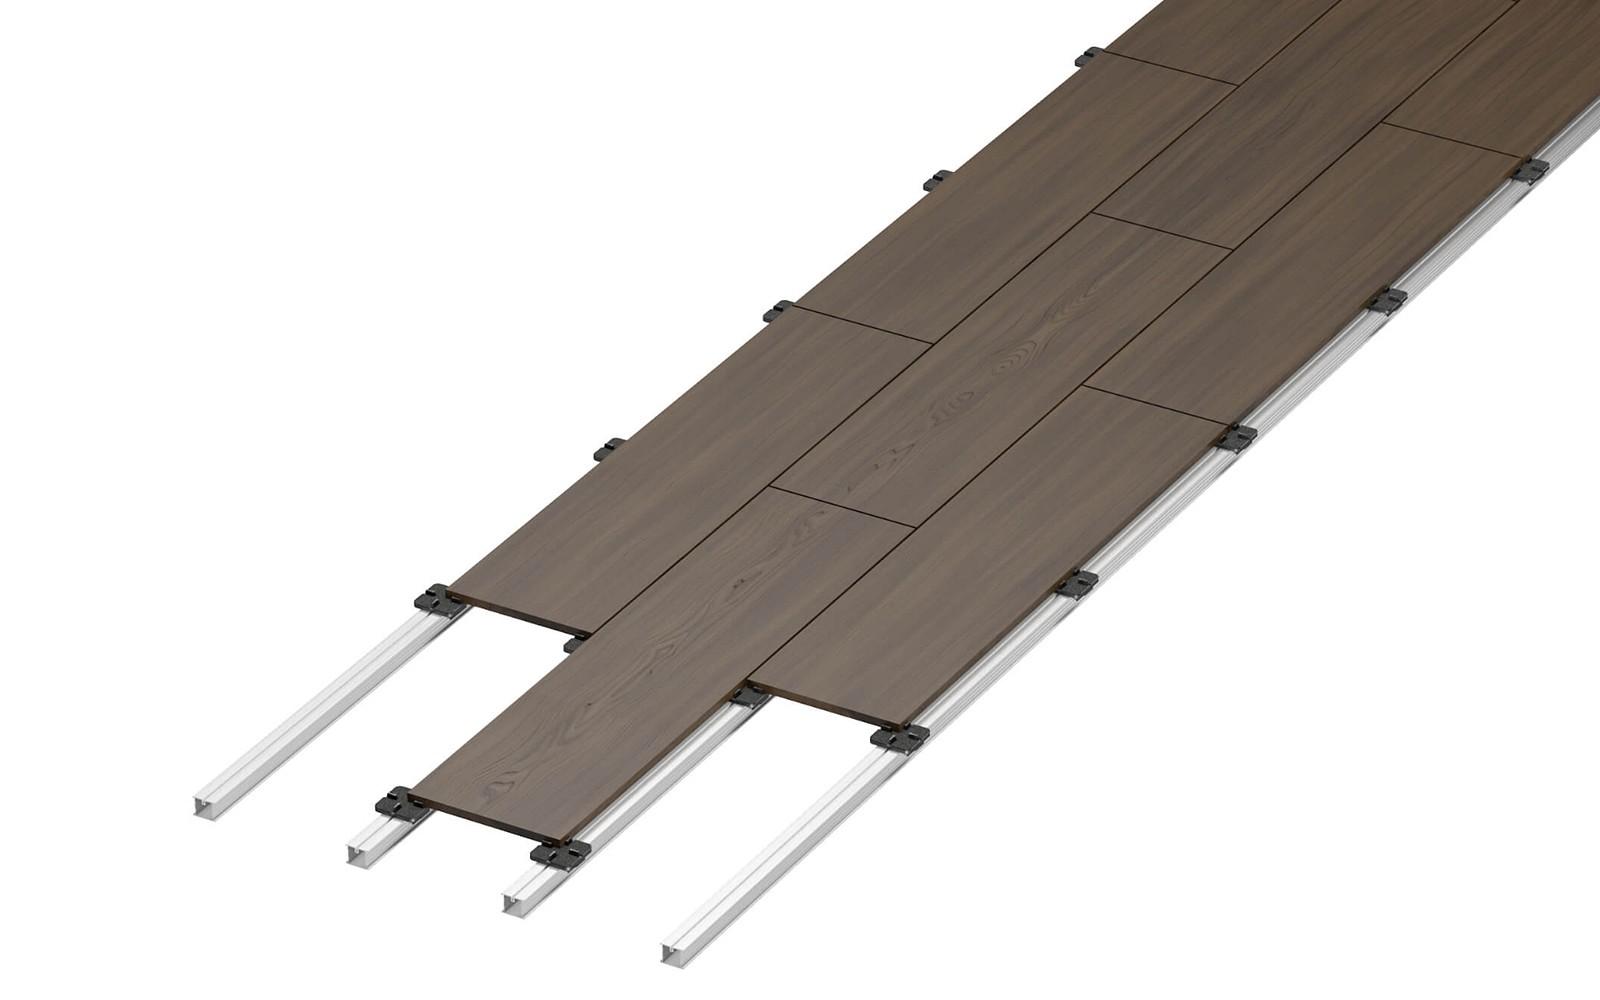 30x100 cm Halbverband